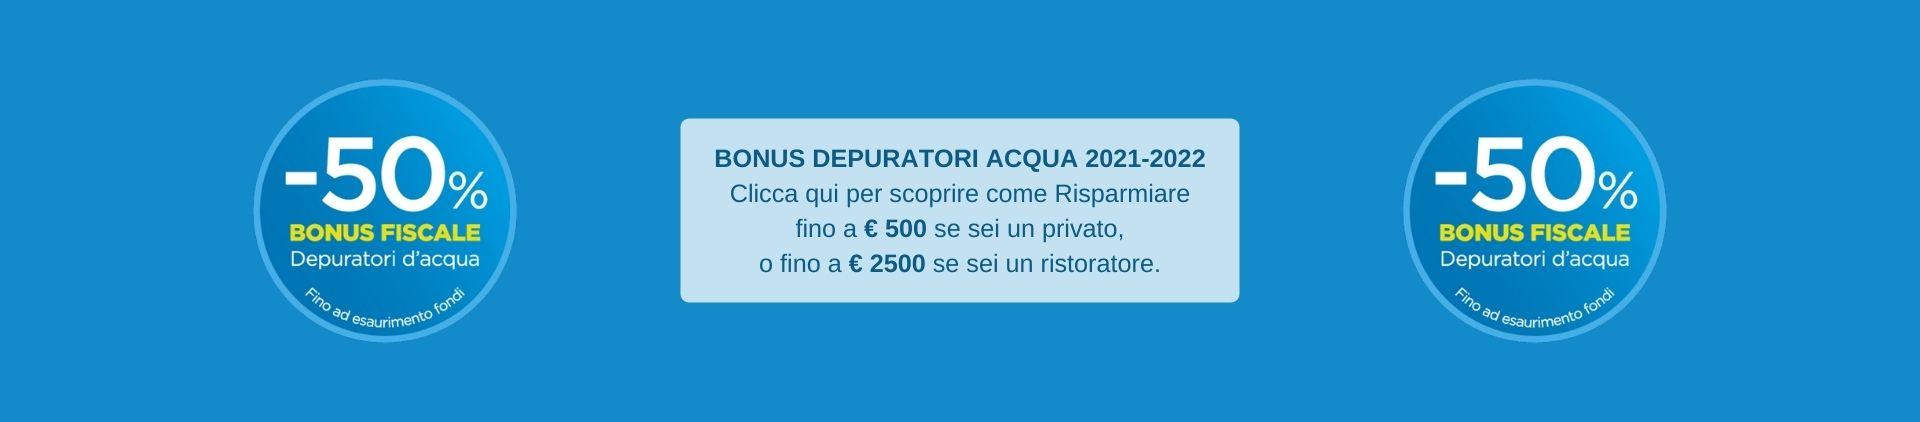 Bonus-Depuratori-Acqua-2021-IDRONORD-MAISTER-banner-2